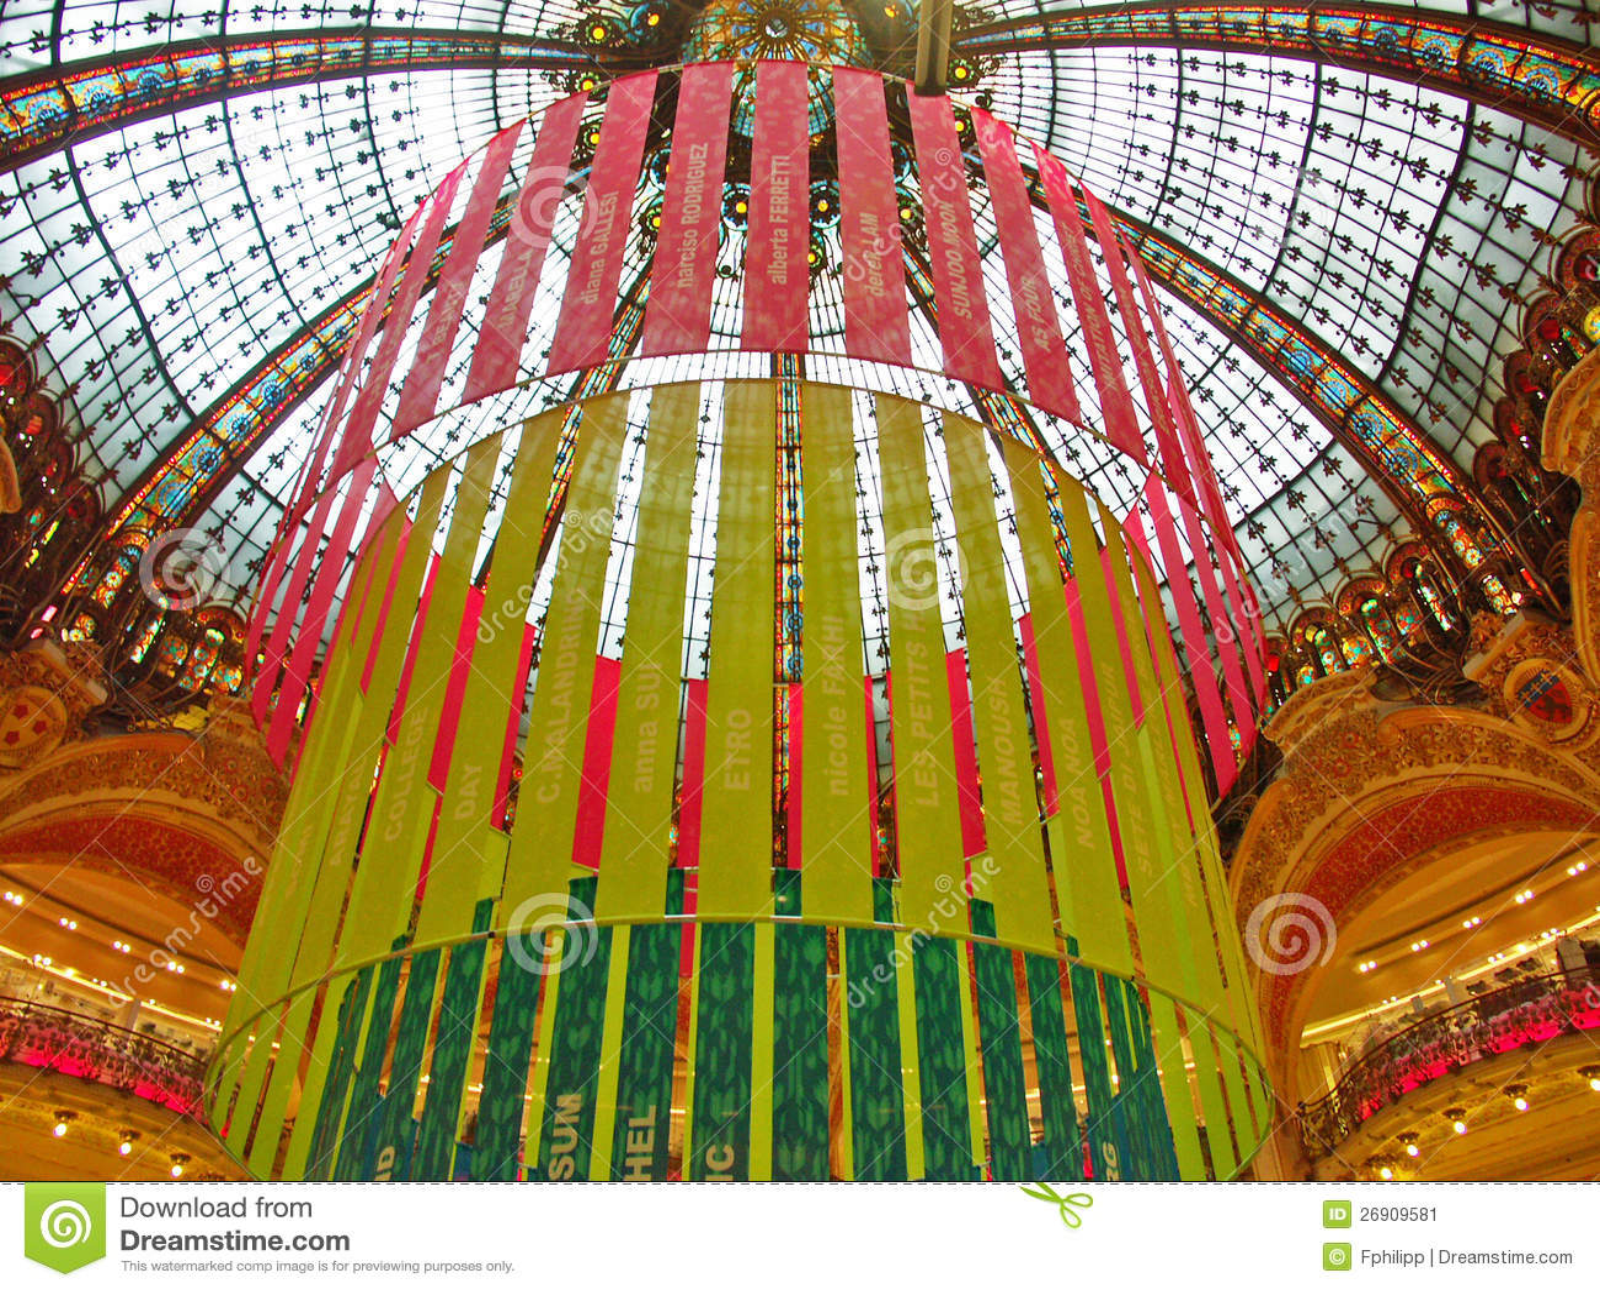 #958312 Paris Décoration De Noël De Galeries Lafayette Photo  5431 décorations de noel galeries lafayette 1300x1065 px @ aertt.com